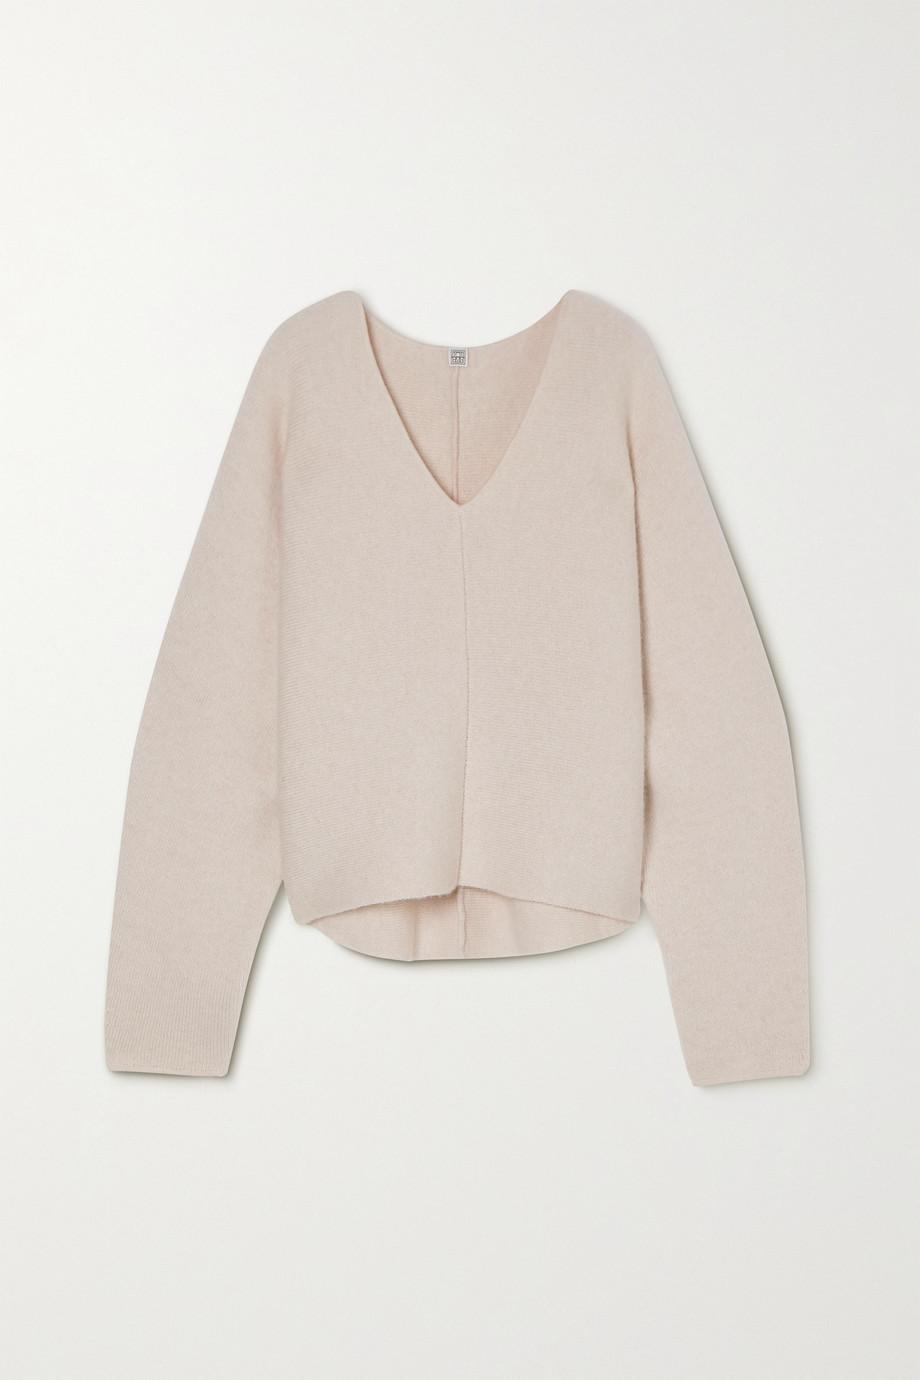 Totême Rennes cashmere sweater